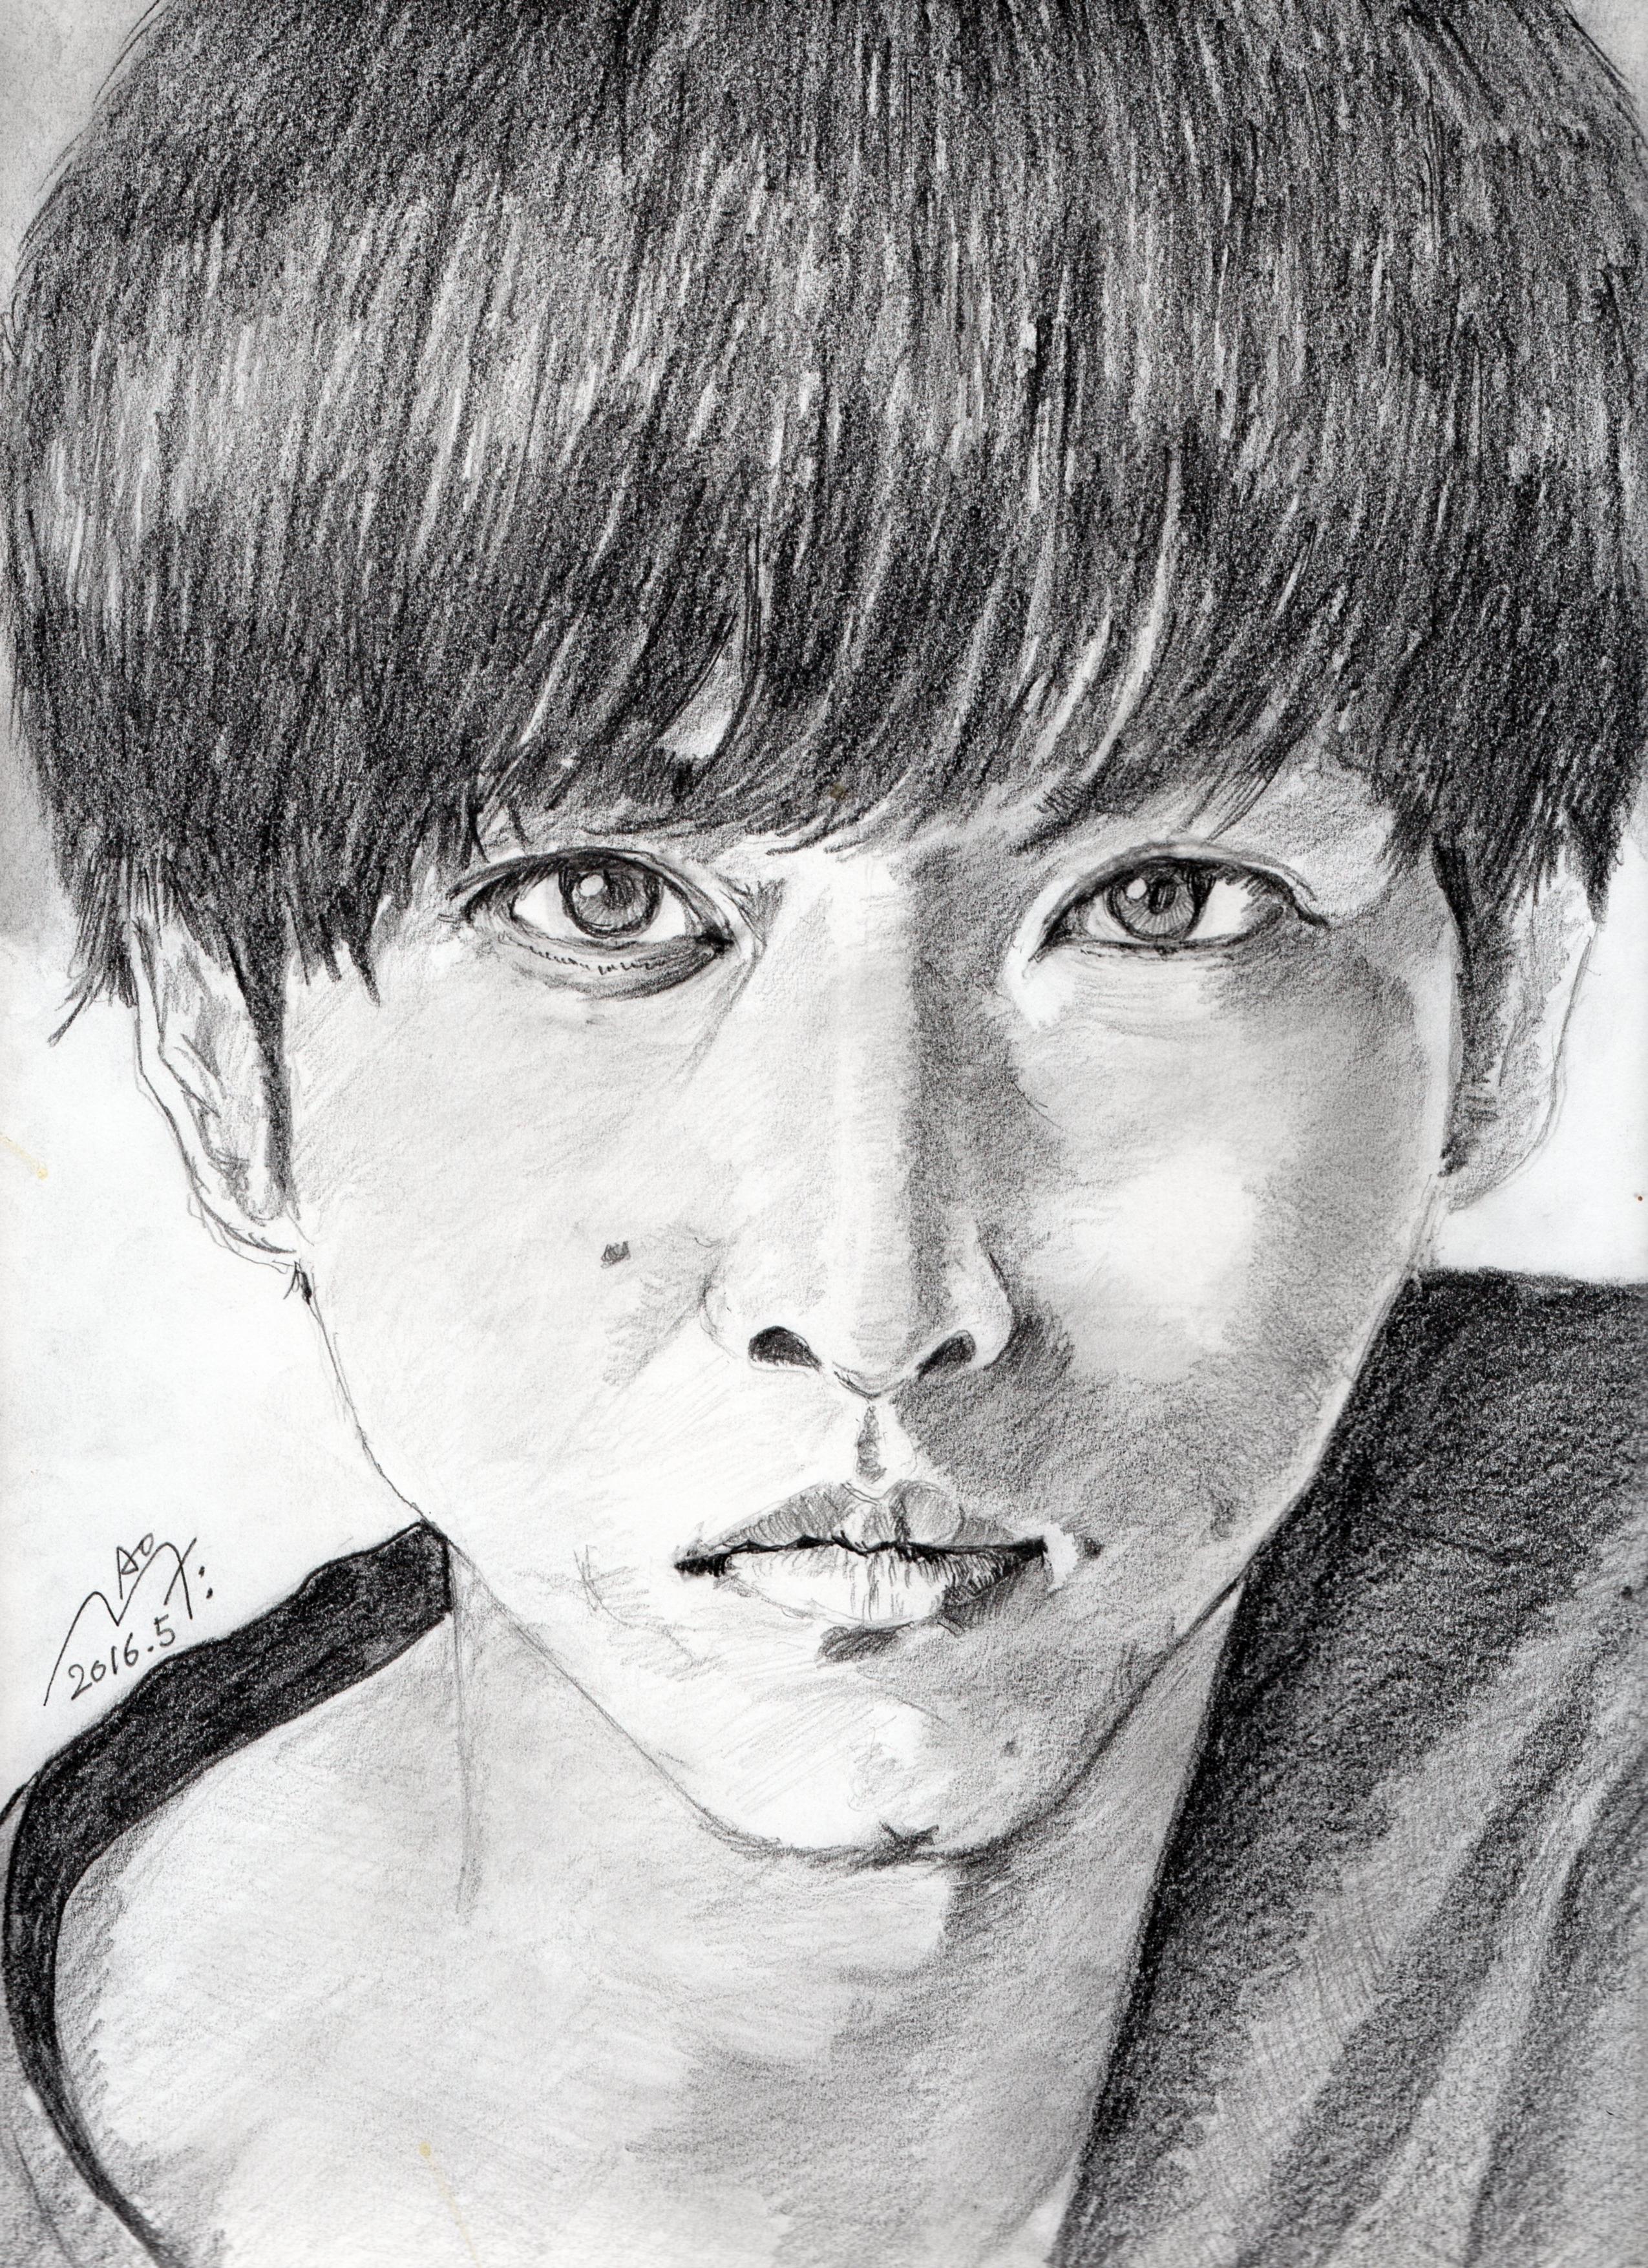 松坂桃李の鉛筆画似顔絵